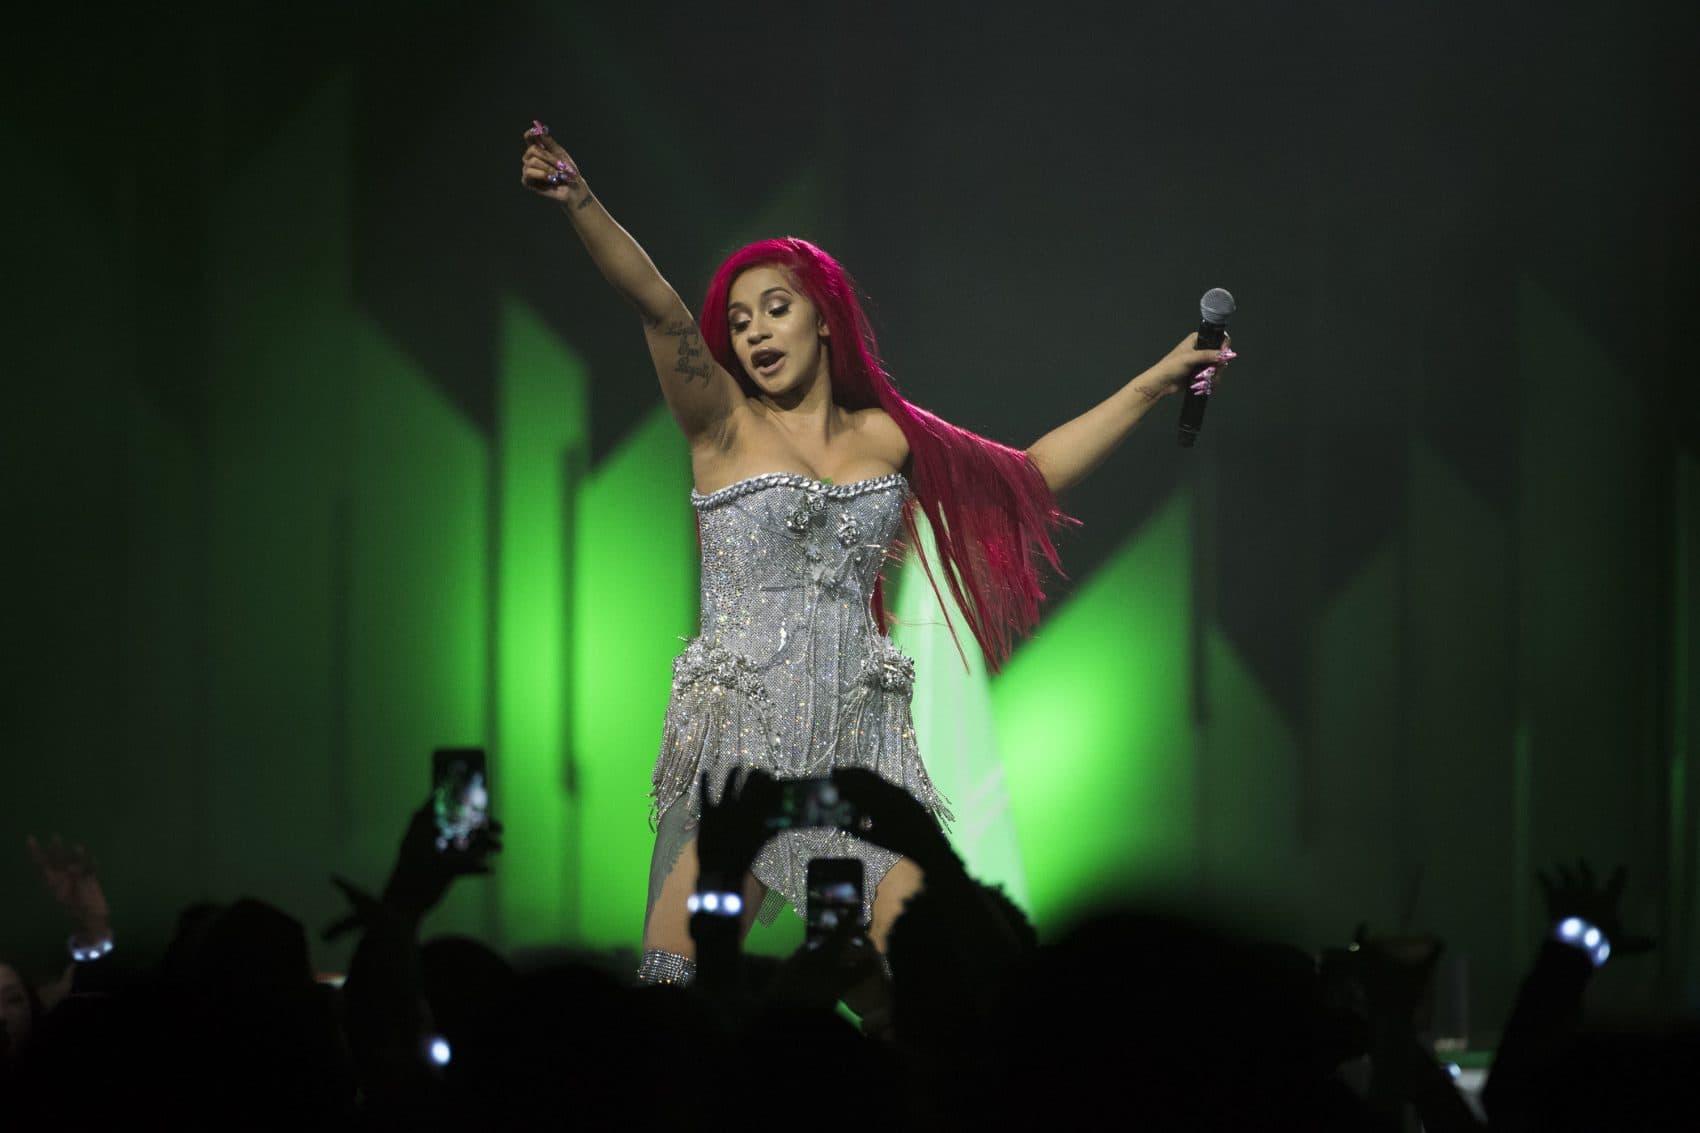 Cardi B performs on stage Dec. 9, 2017. (Arthur Mola/Invision/AP)